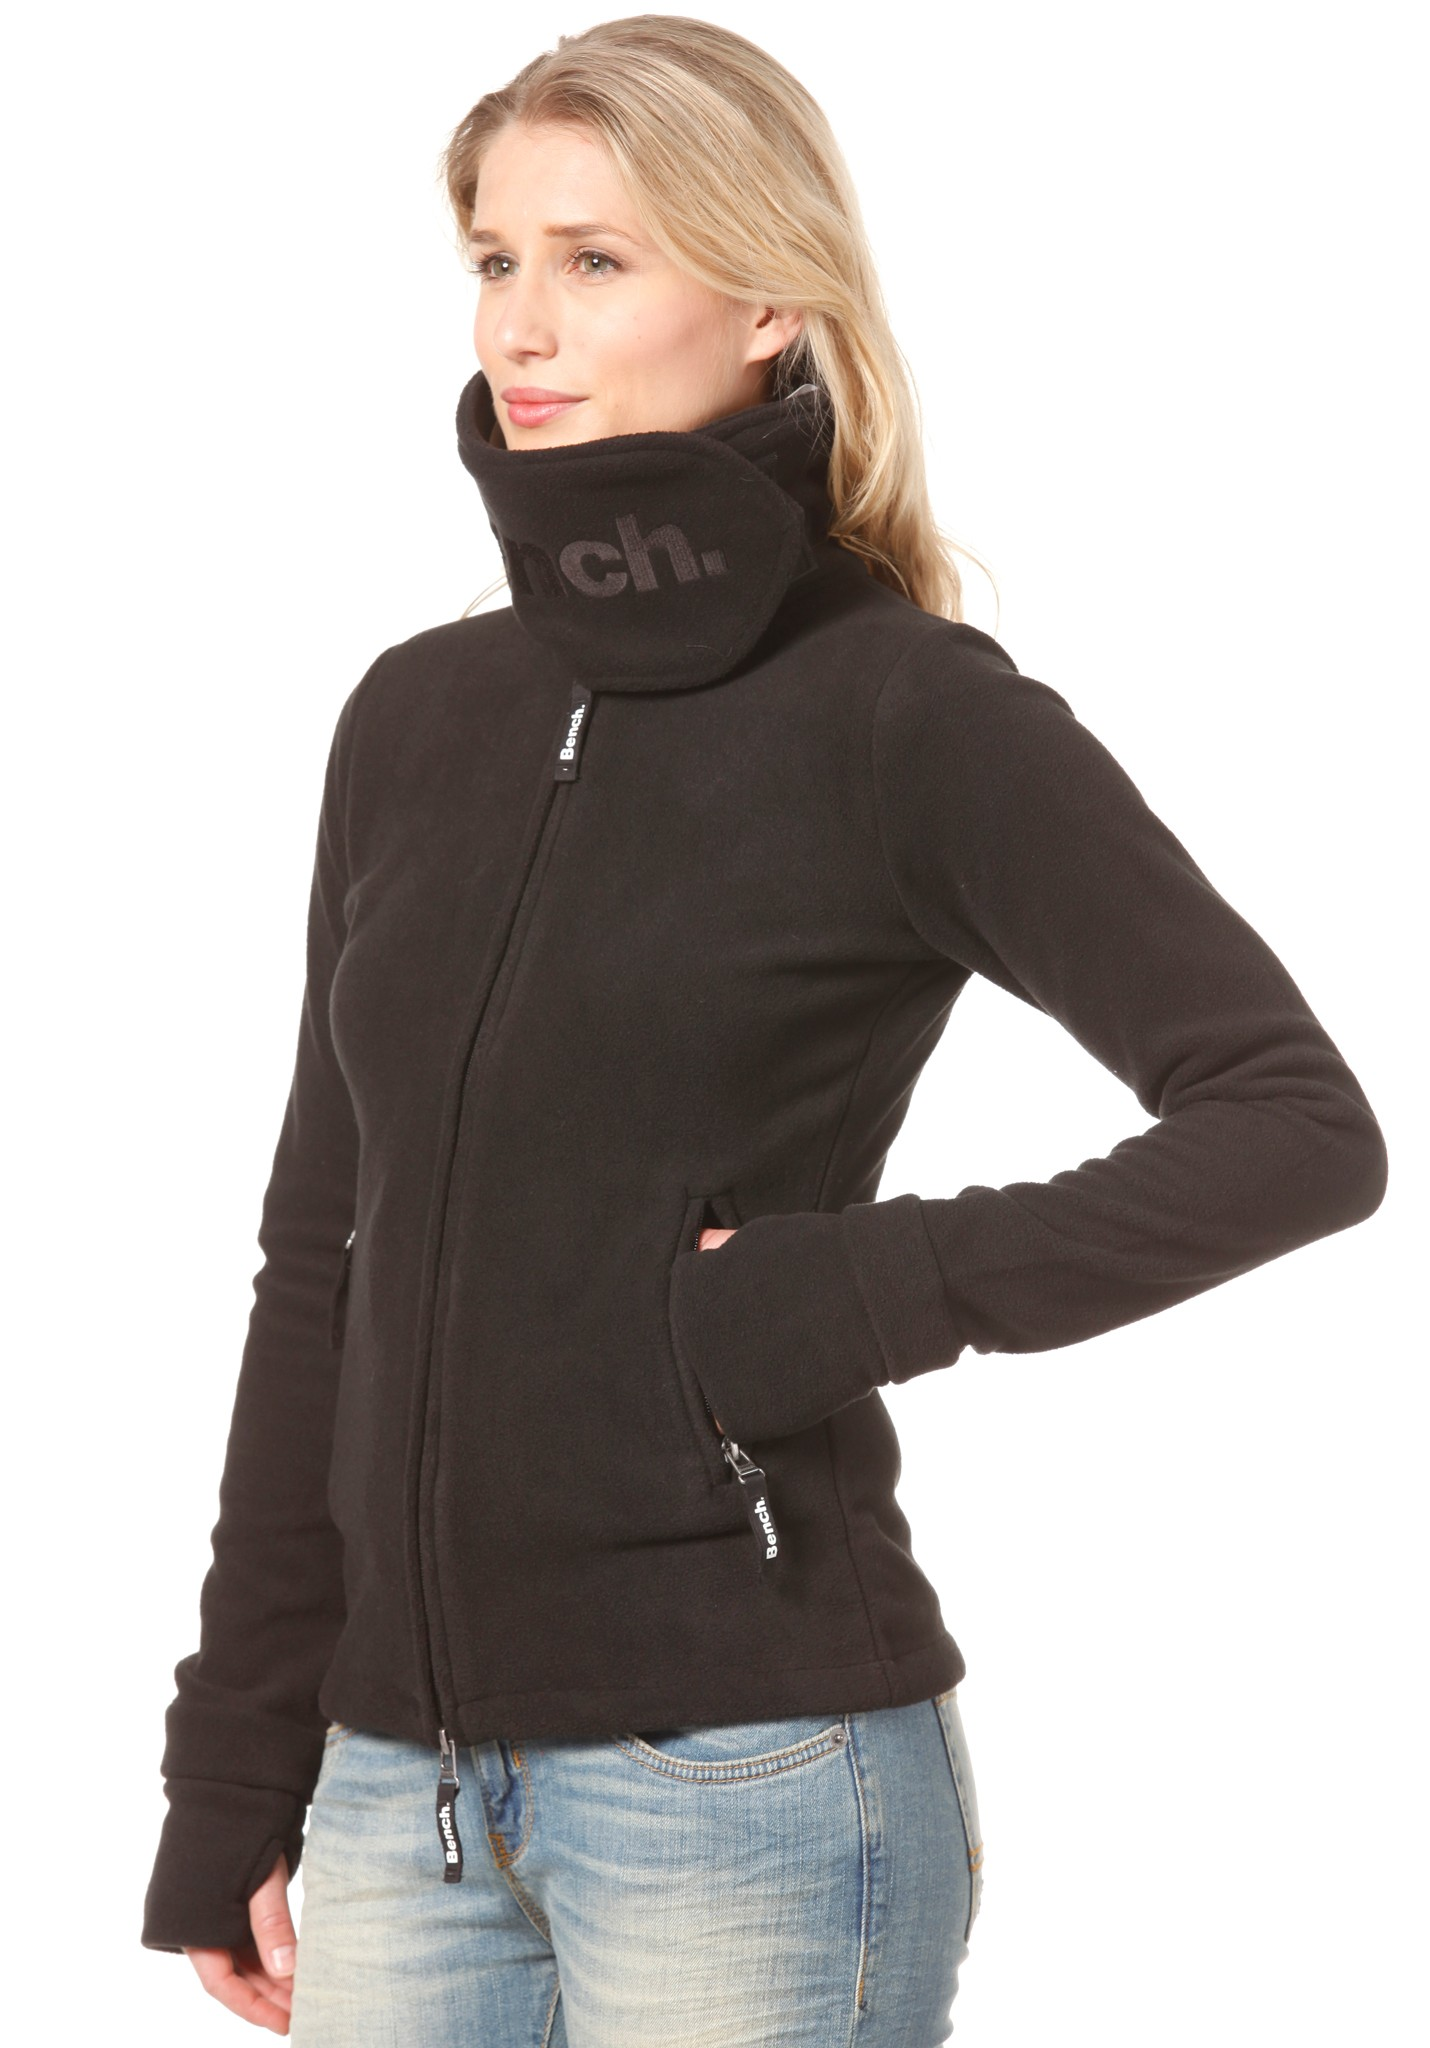 neu bench funnel neck fleece jacket damen sweatjacke jacke. Black Bedroom Furniture Sets. Home Design Ideas